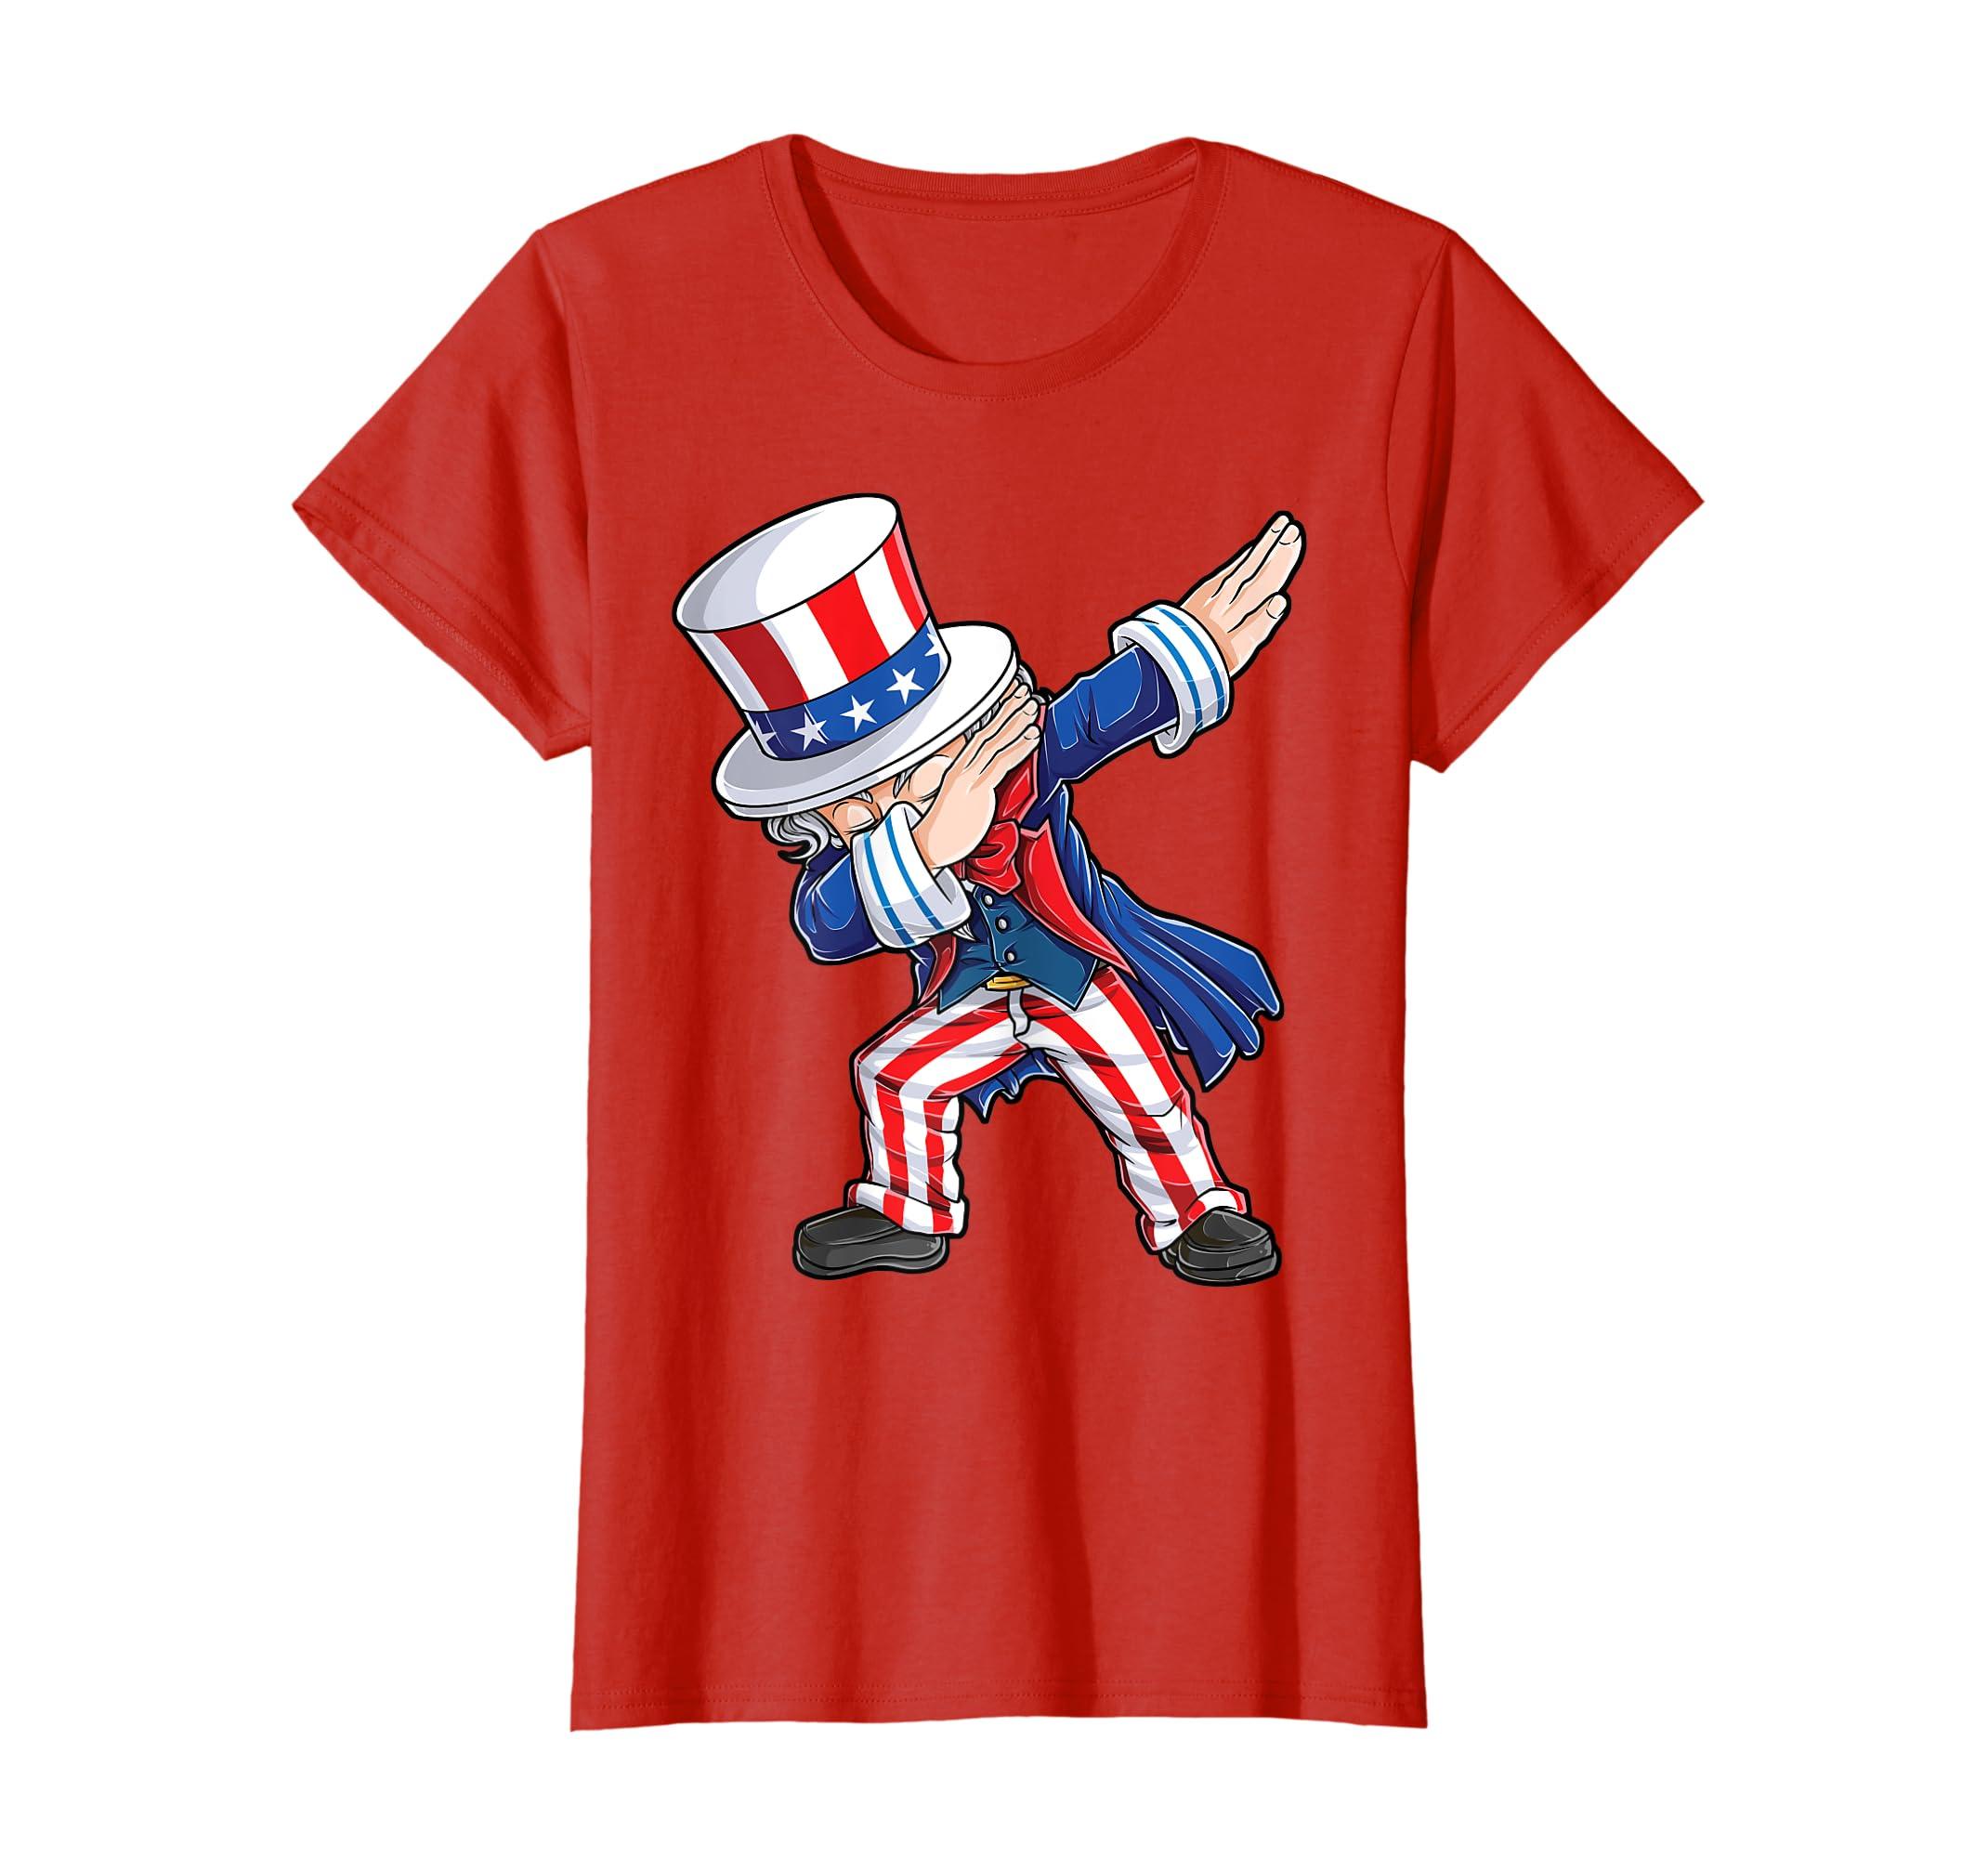 1ea6e2af Amazon.com: Dabbing Uncle Sam T Shirt 4th of July Kids Boys Men Gifts:  Clothing